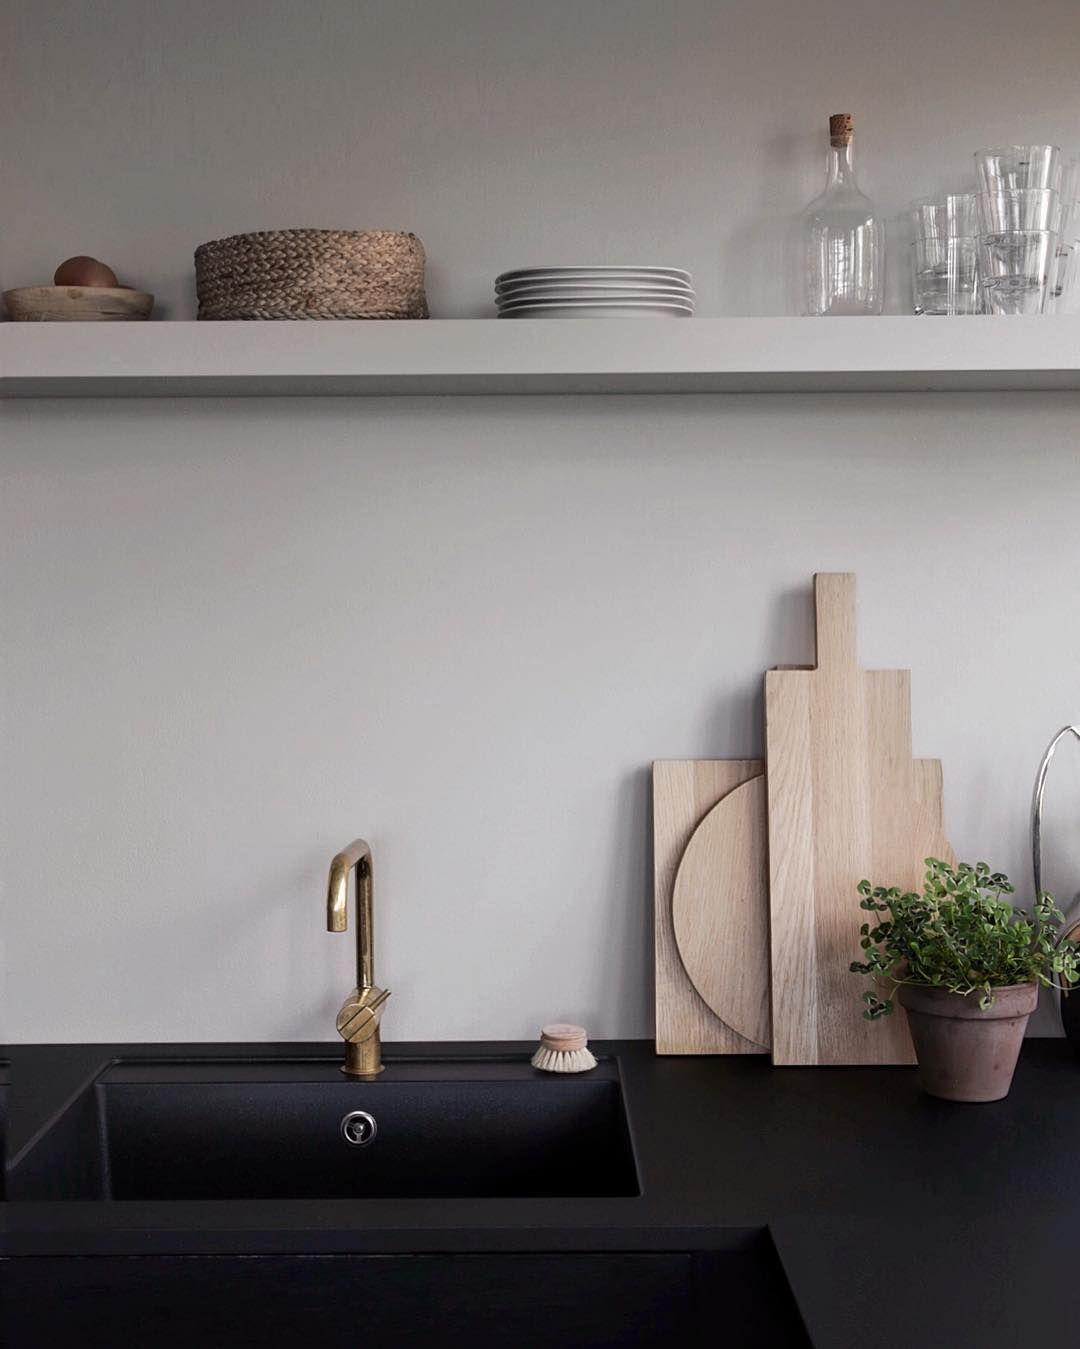 "2,066 Likes, 54 Comments - Nina Holst (@stylizimoblog) on Instagram: ""Good morning from the kitchen! Wish you all a wonderful day 🌿 #kitchen #blackkitchen #stylizimohouse"""